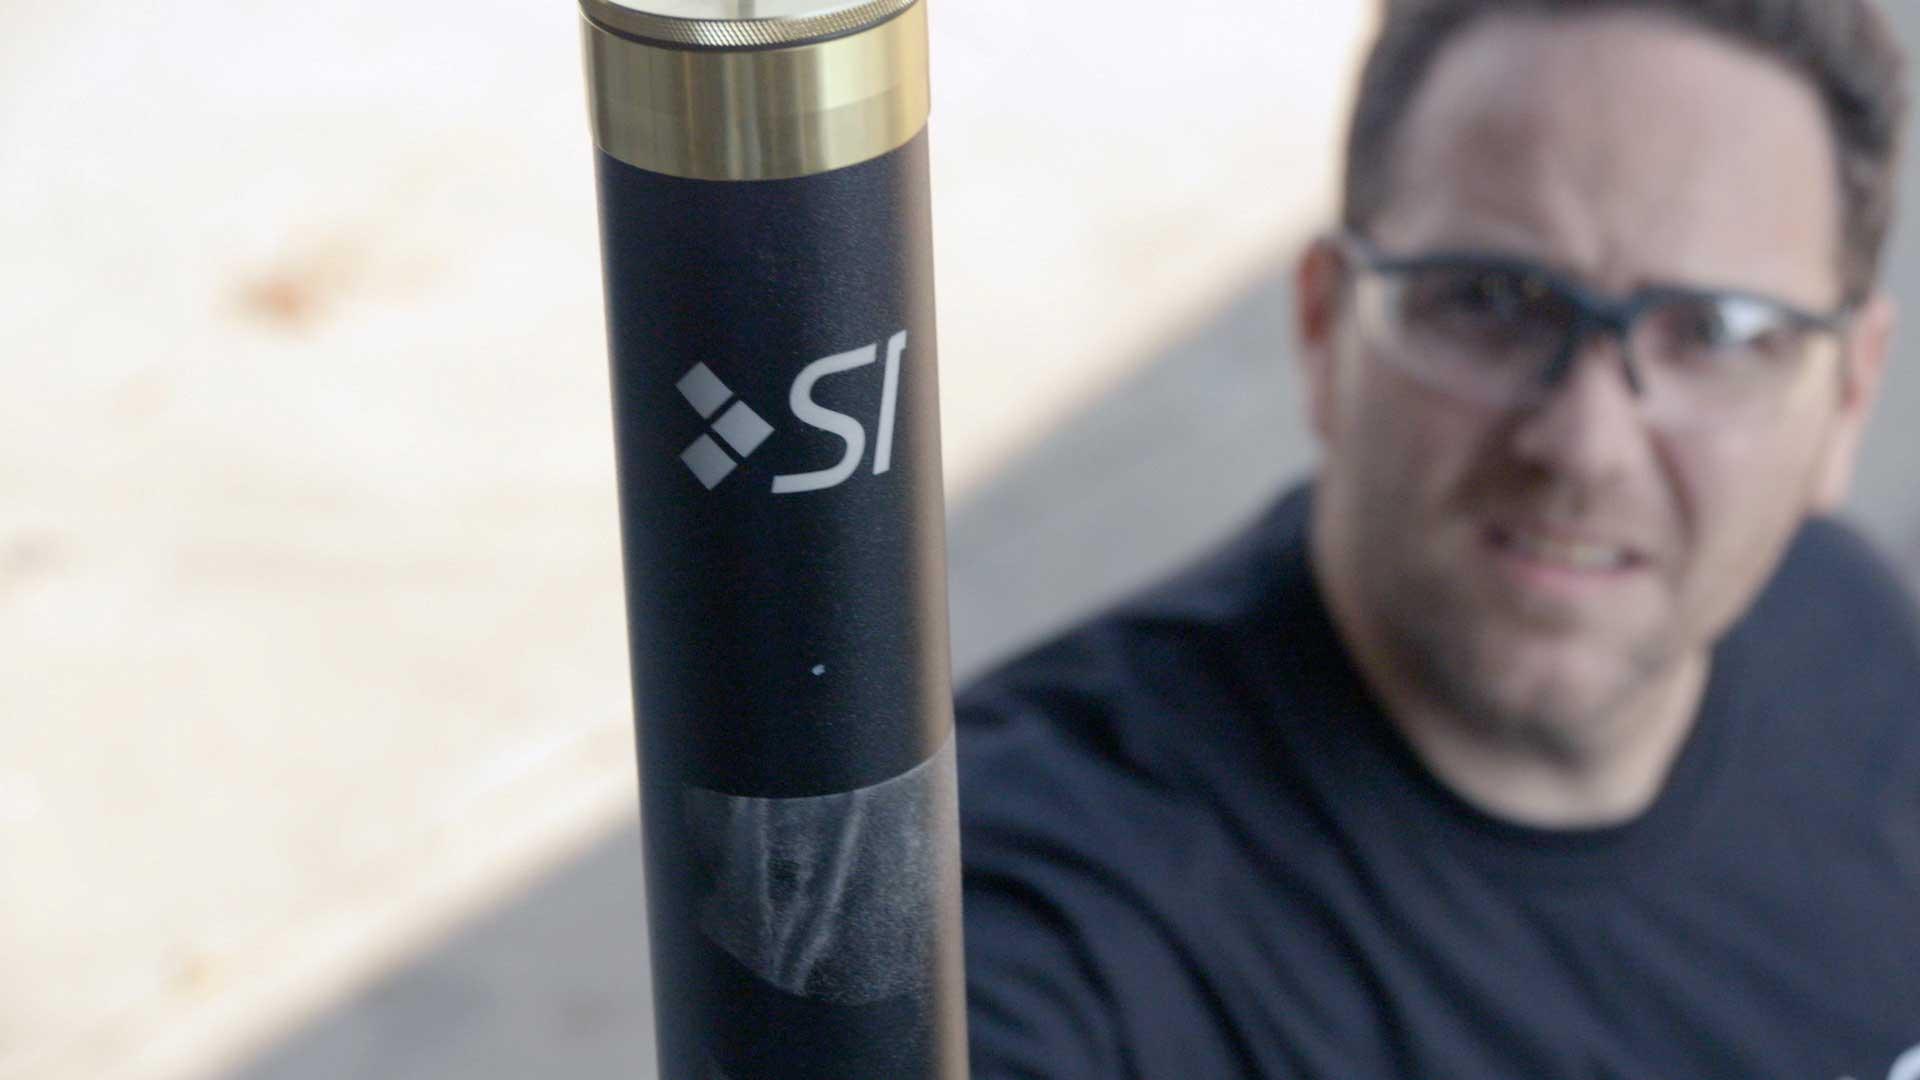 NASA screen storage tube